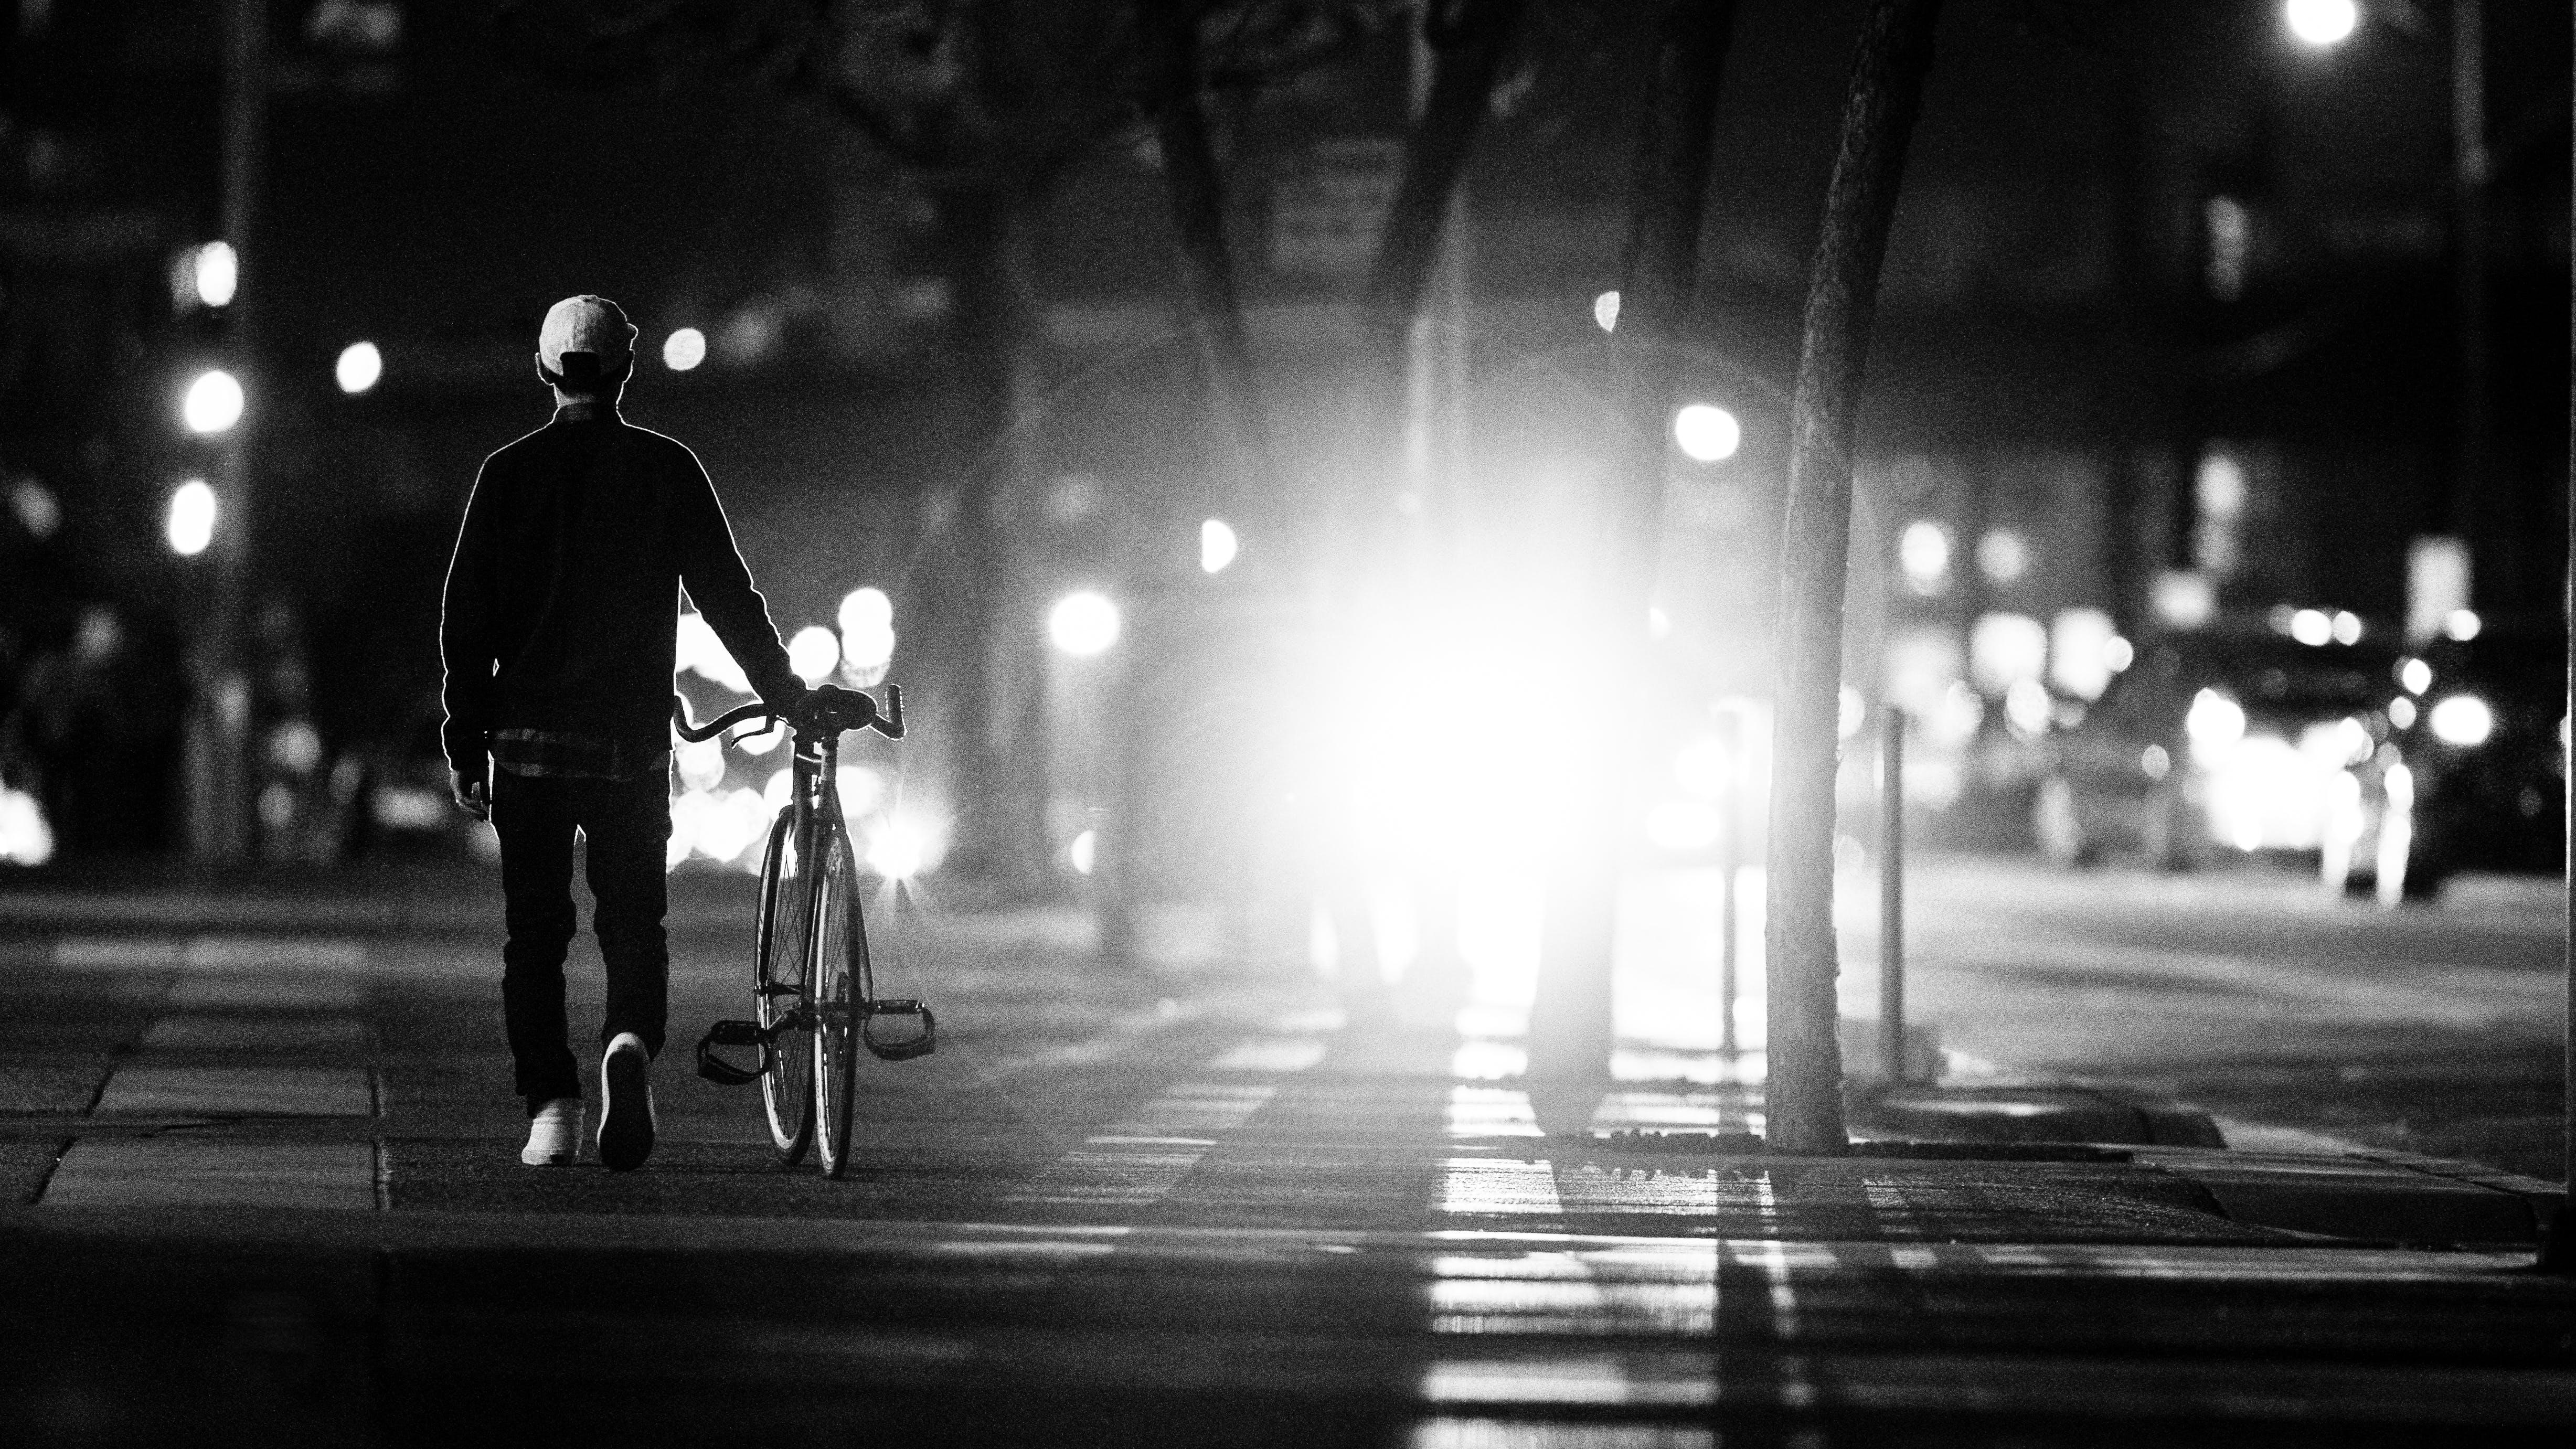 bicycle, bike, black-and-white